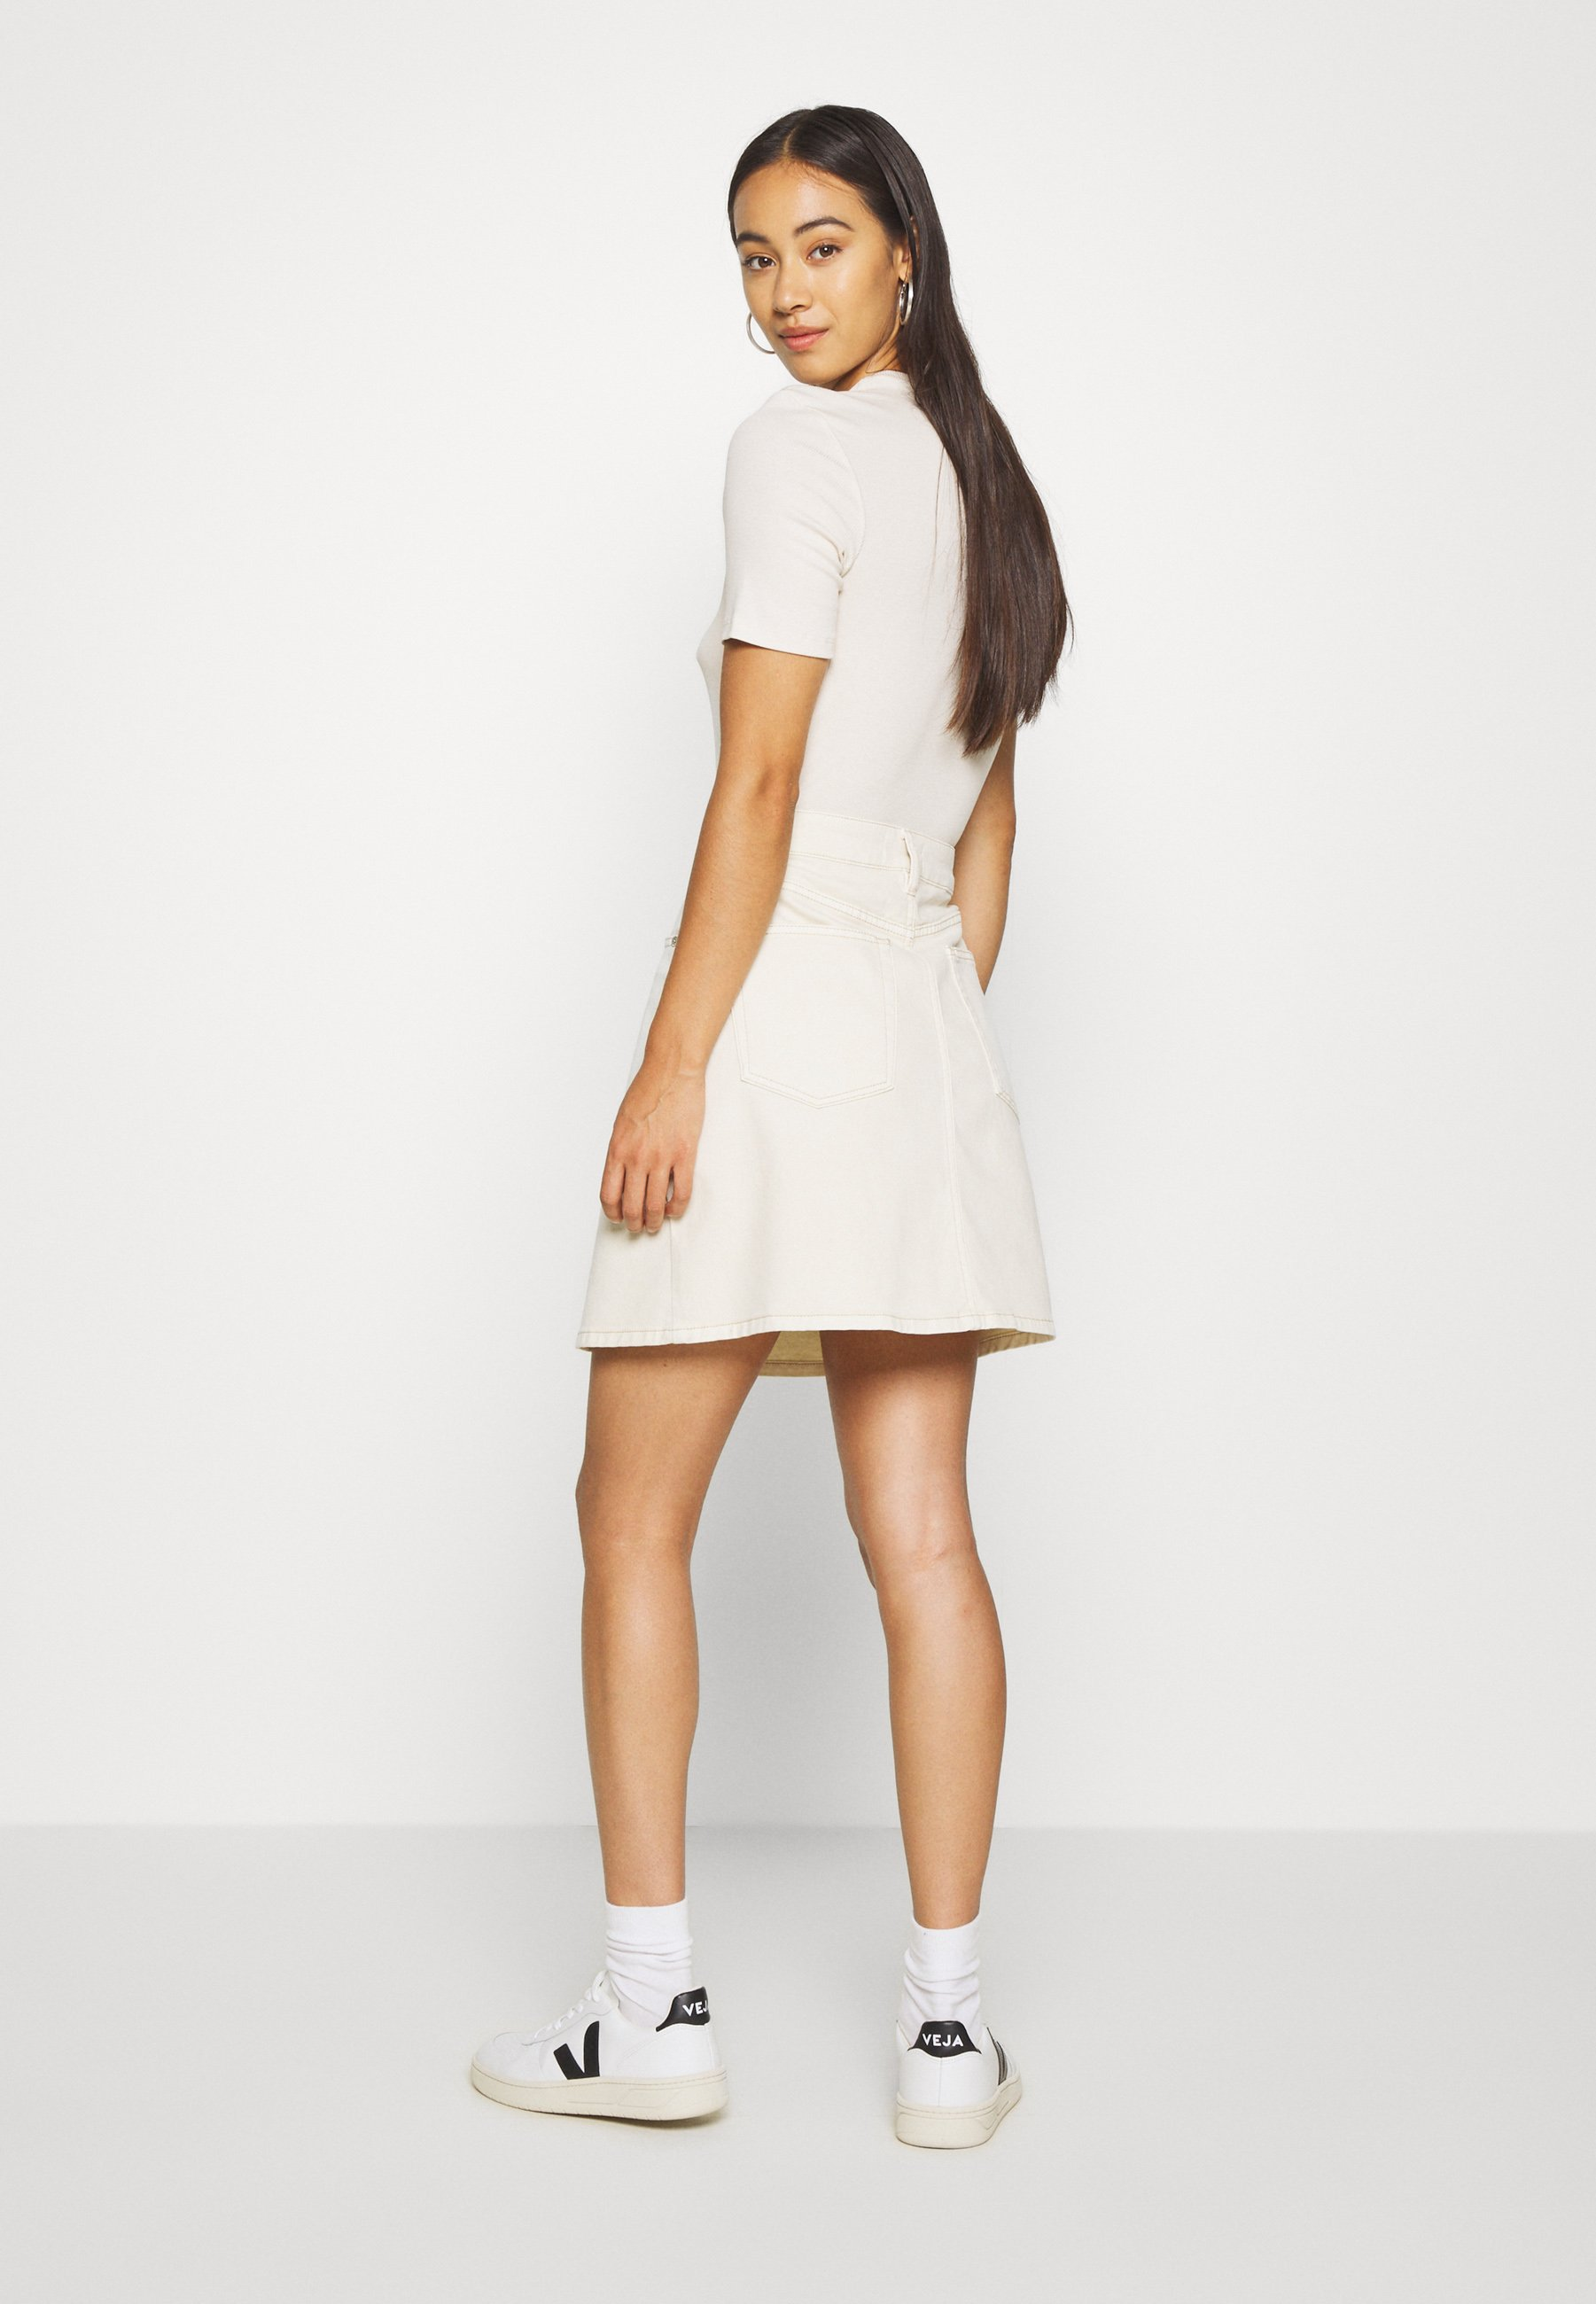 Purchase Cheap Women's Clothing Ivy Copenhagen ANGIE SKIRT WASH Mini skirt ecru 1HbBoH9mf